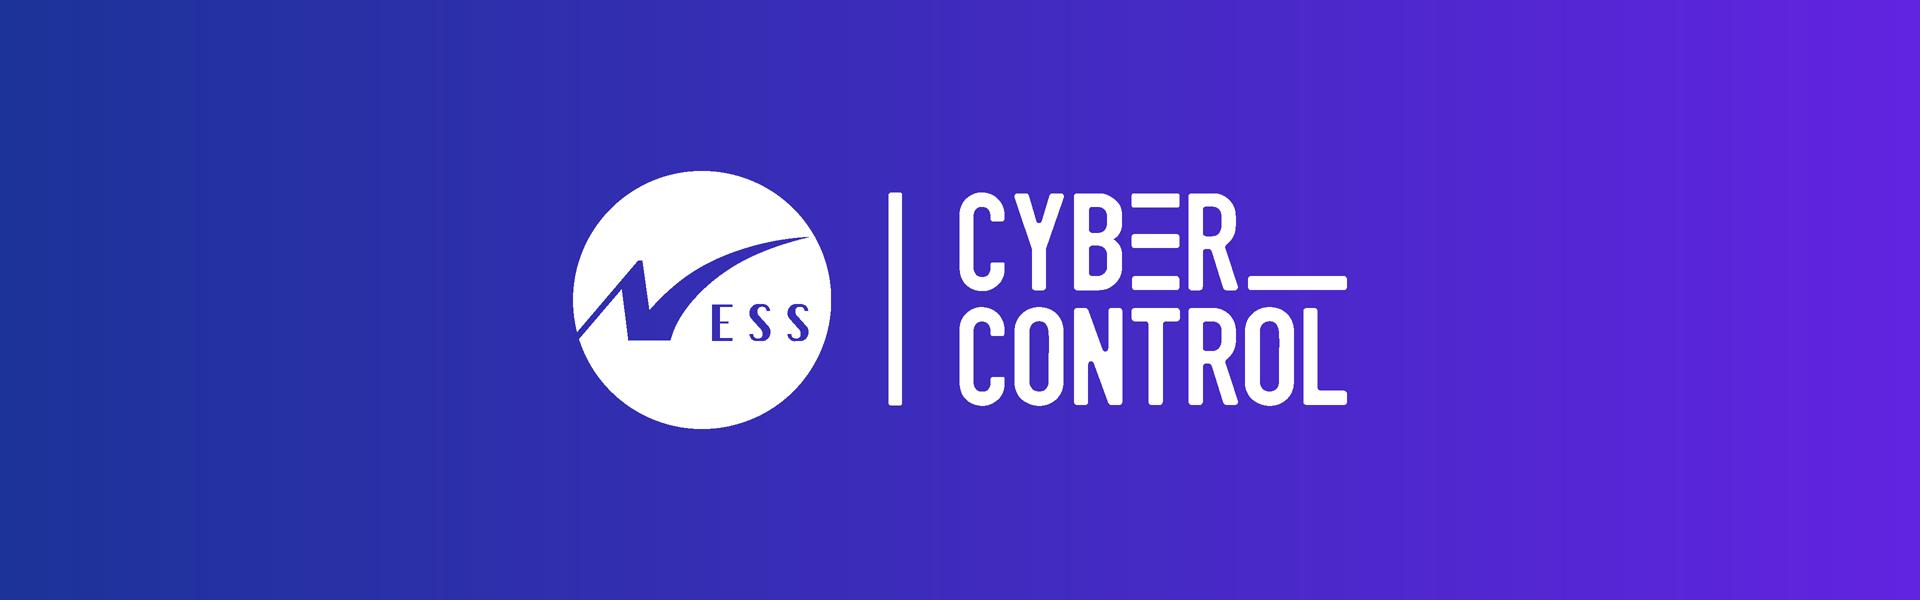 Ness Cyber control logo